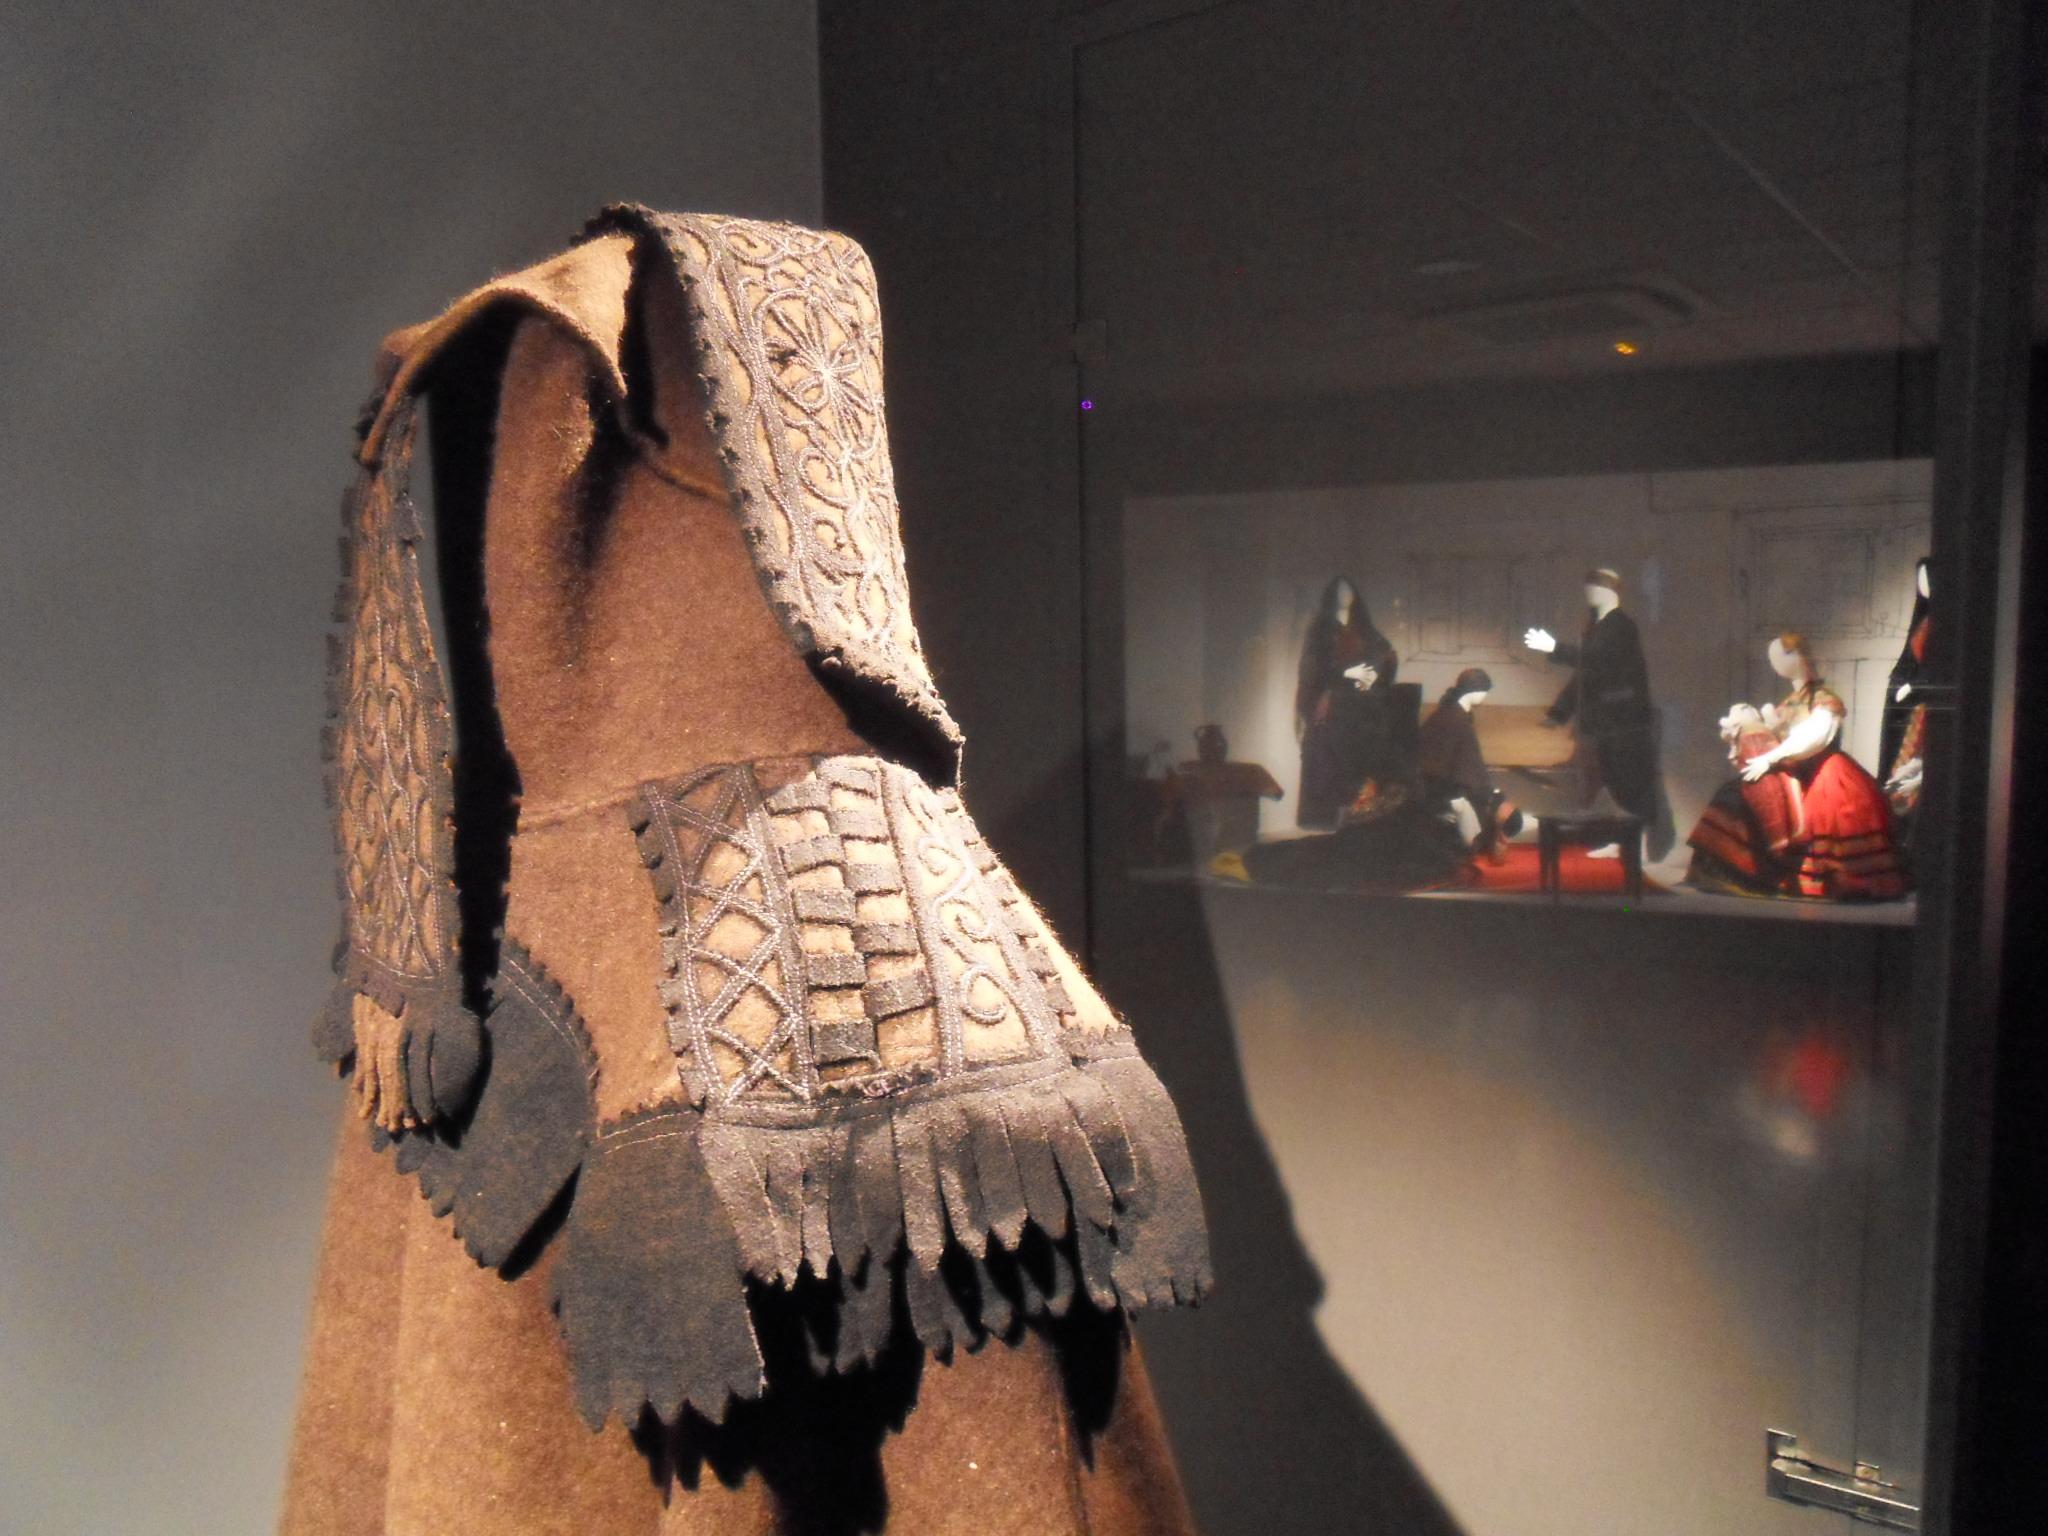 Pieza invitada año 2013: la capa de chiva alistana